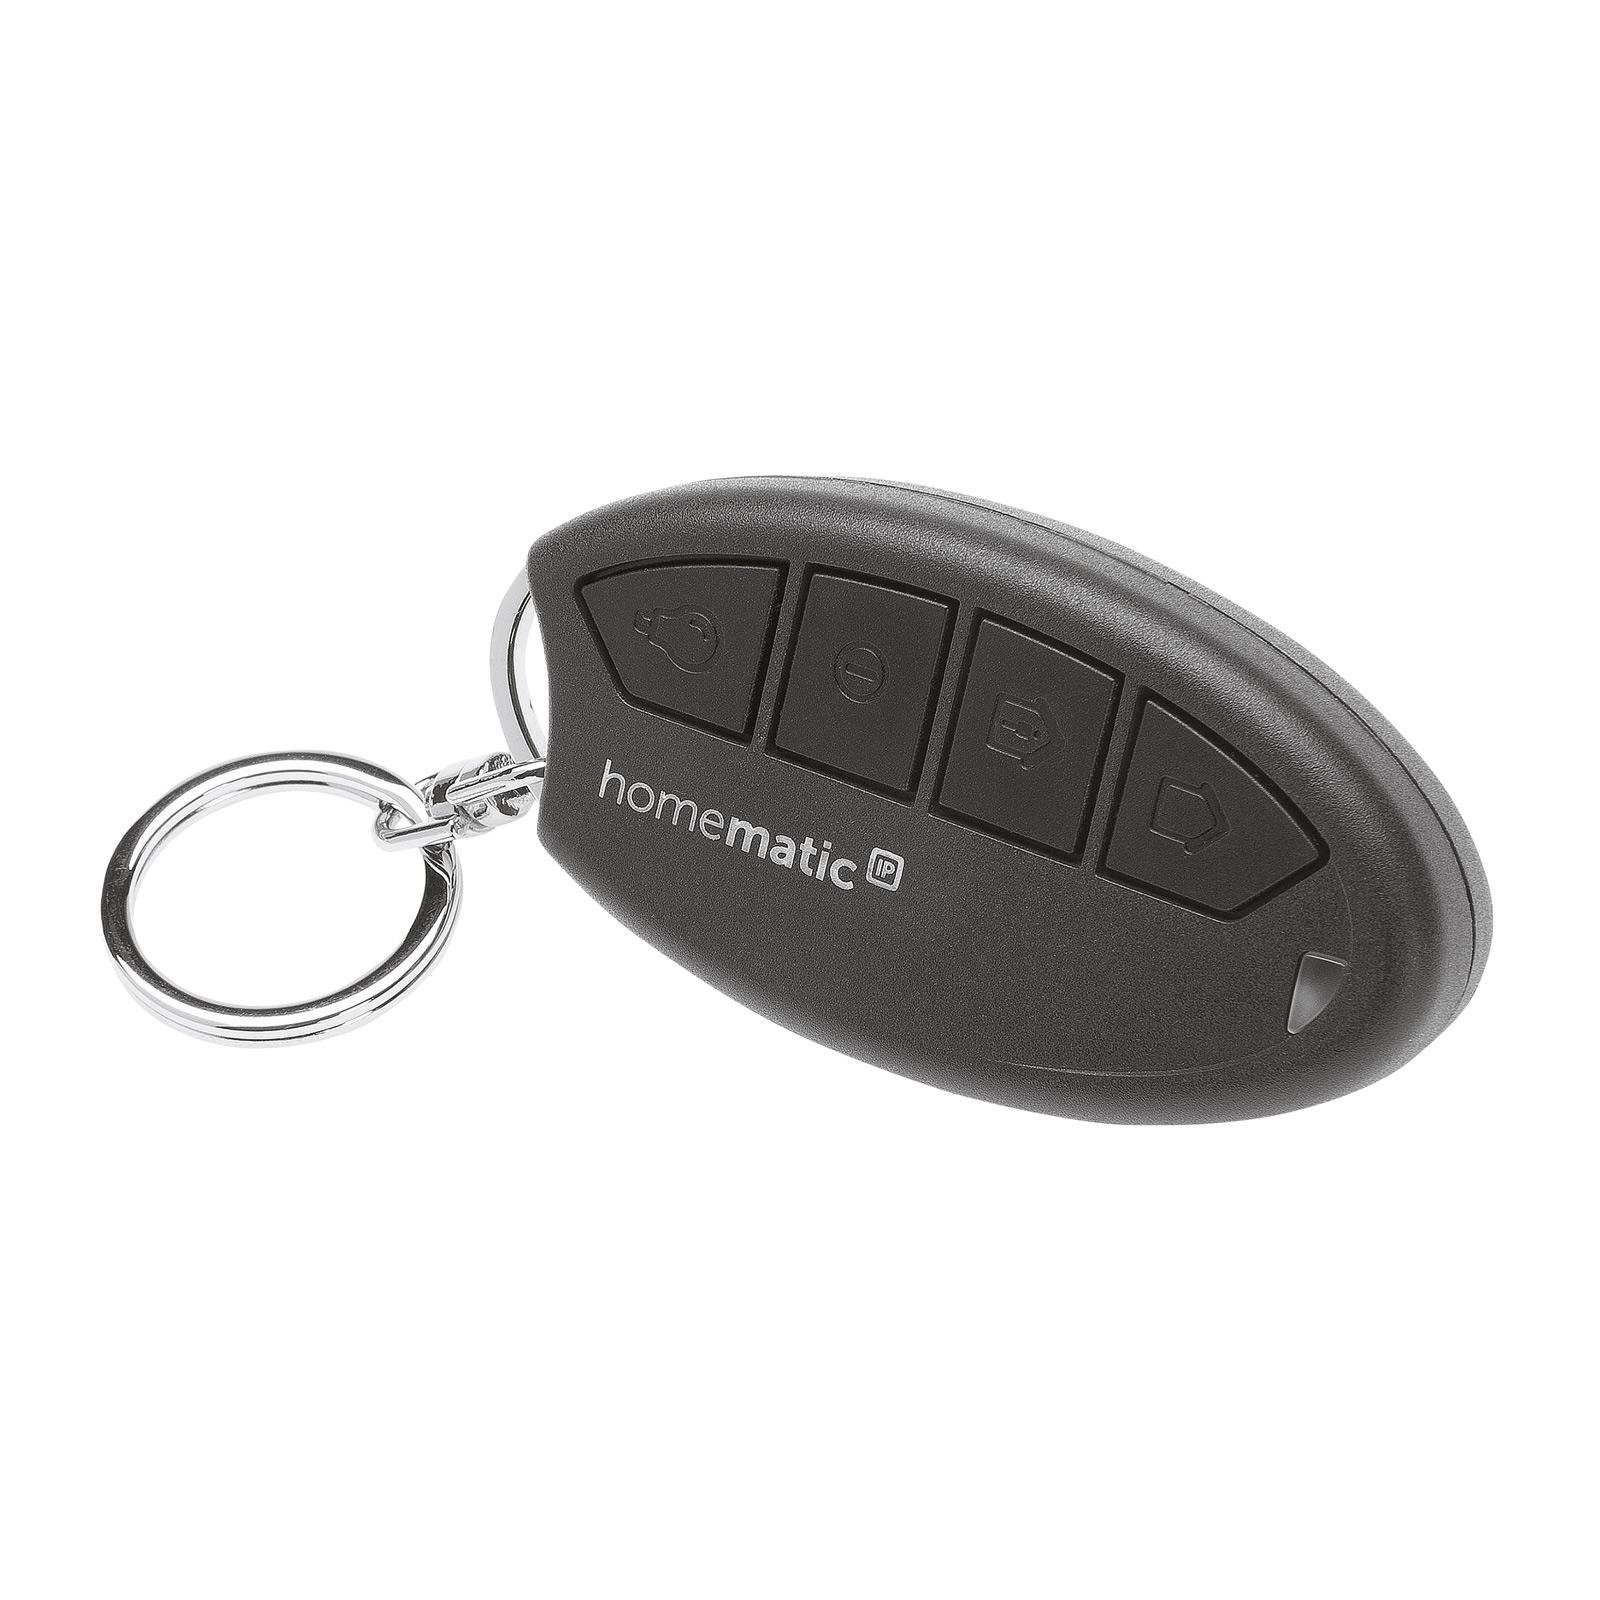 Homematic IP pilot do kluczy dla alarmu